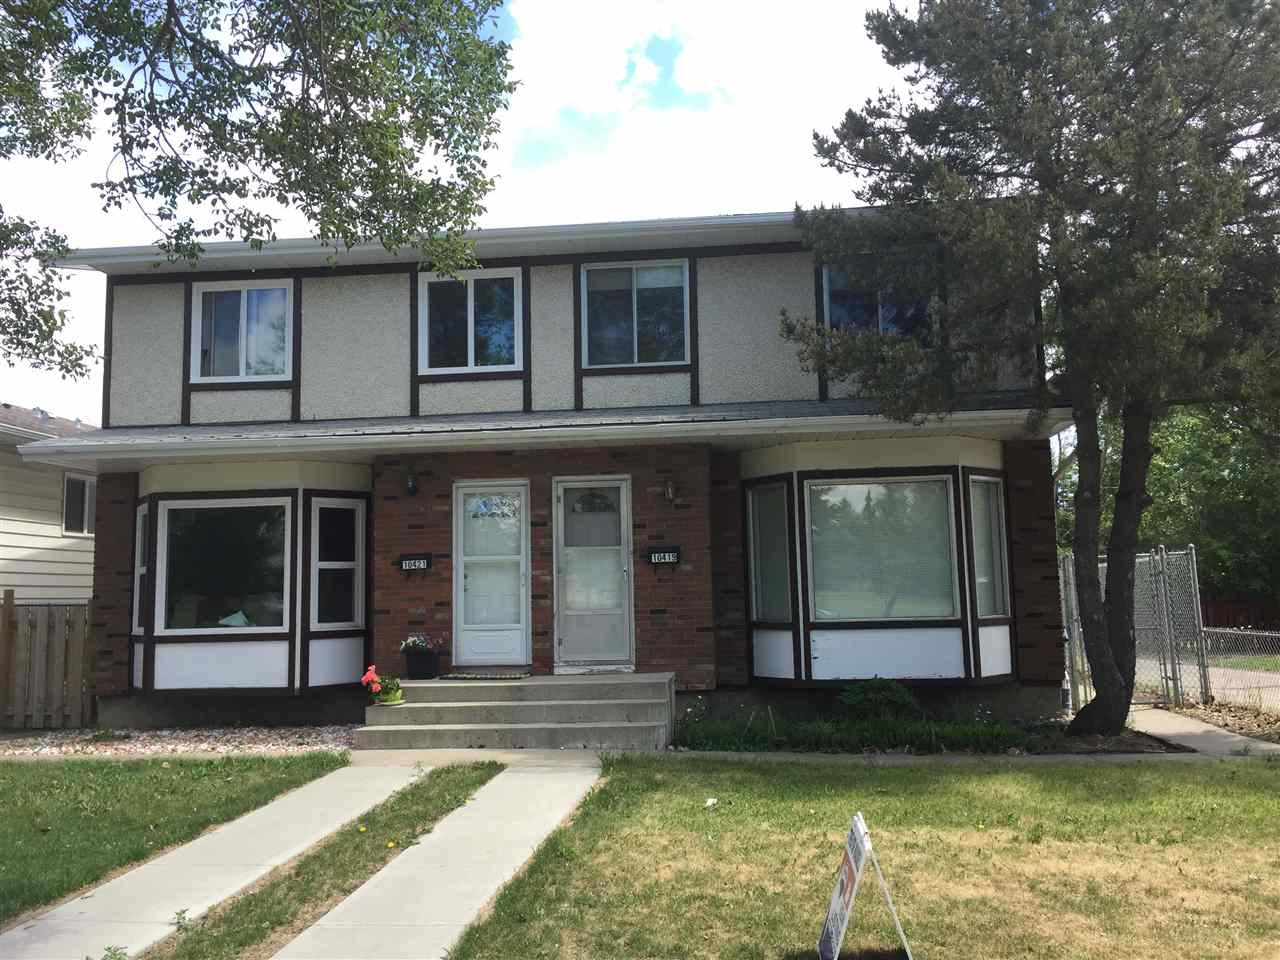 Main Photo: 10419 150 Street in Edmonton: Zone 21 House Half Duplex for sale : MLS®# E4168260